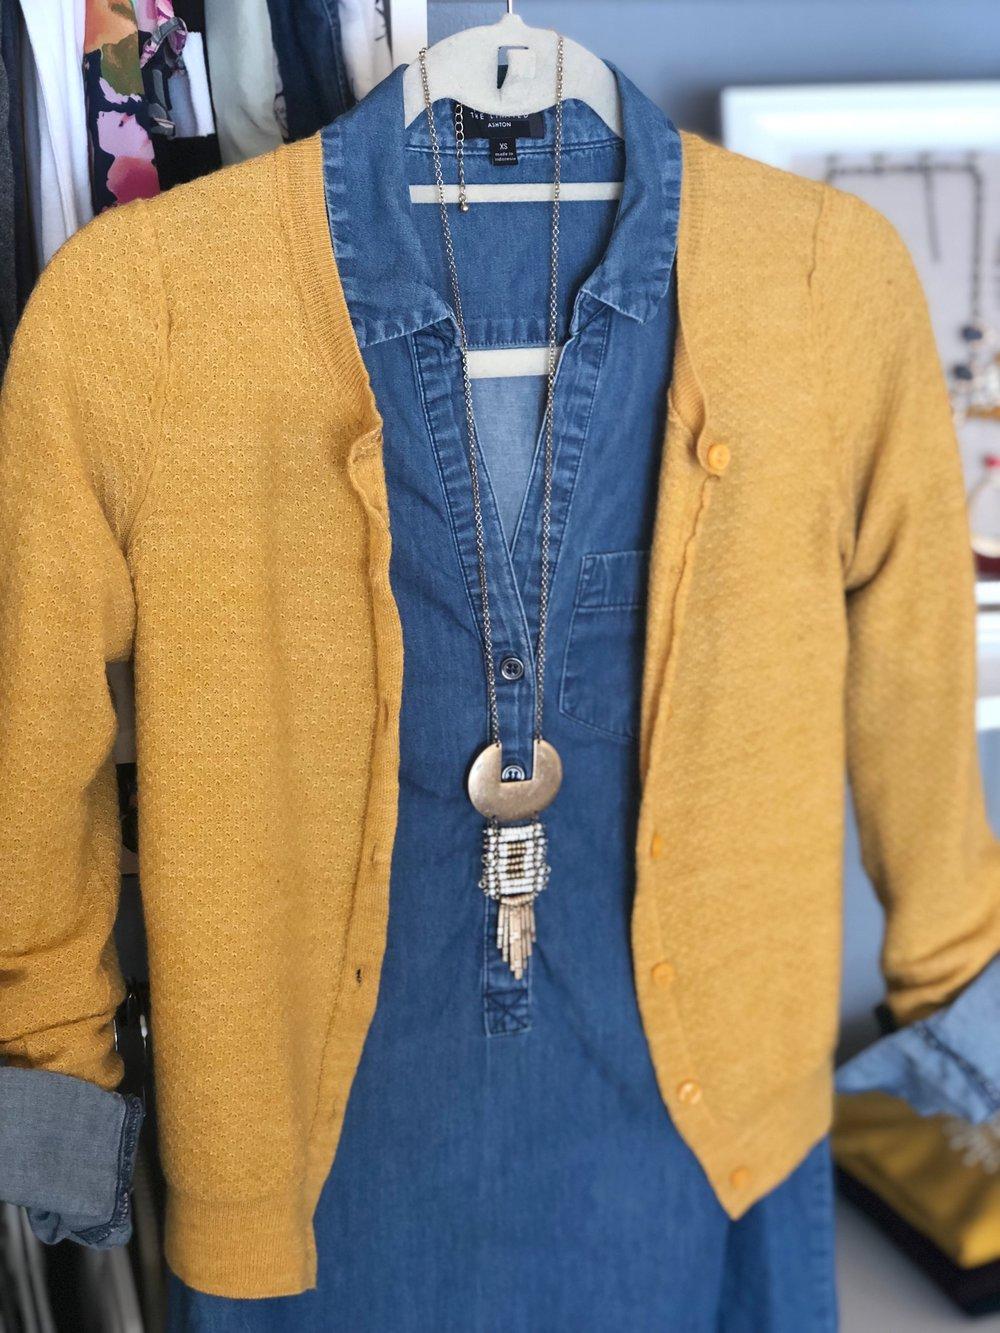 Denver Personal Stylist - Six Ways to Style a Vest